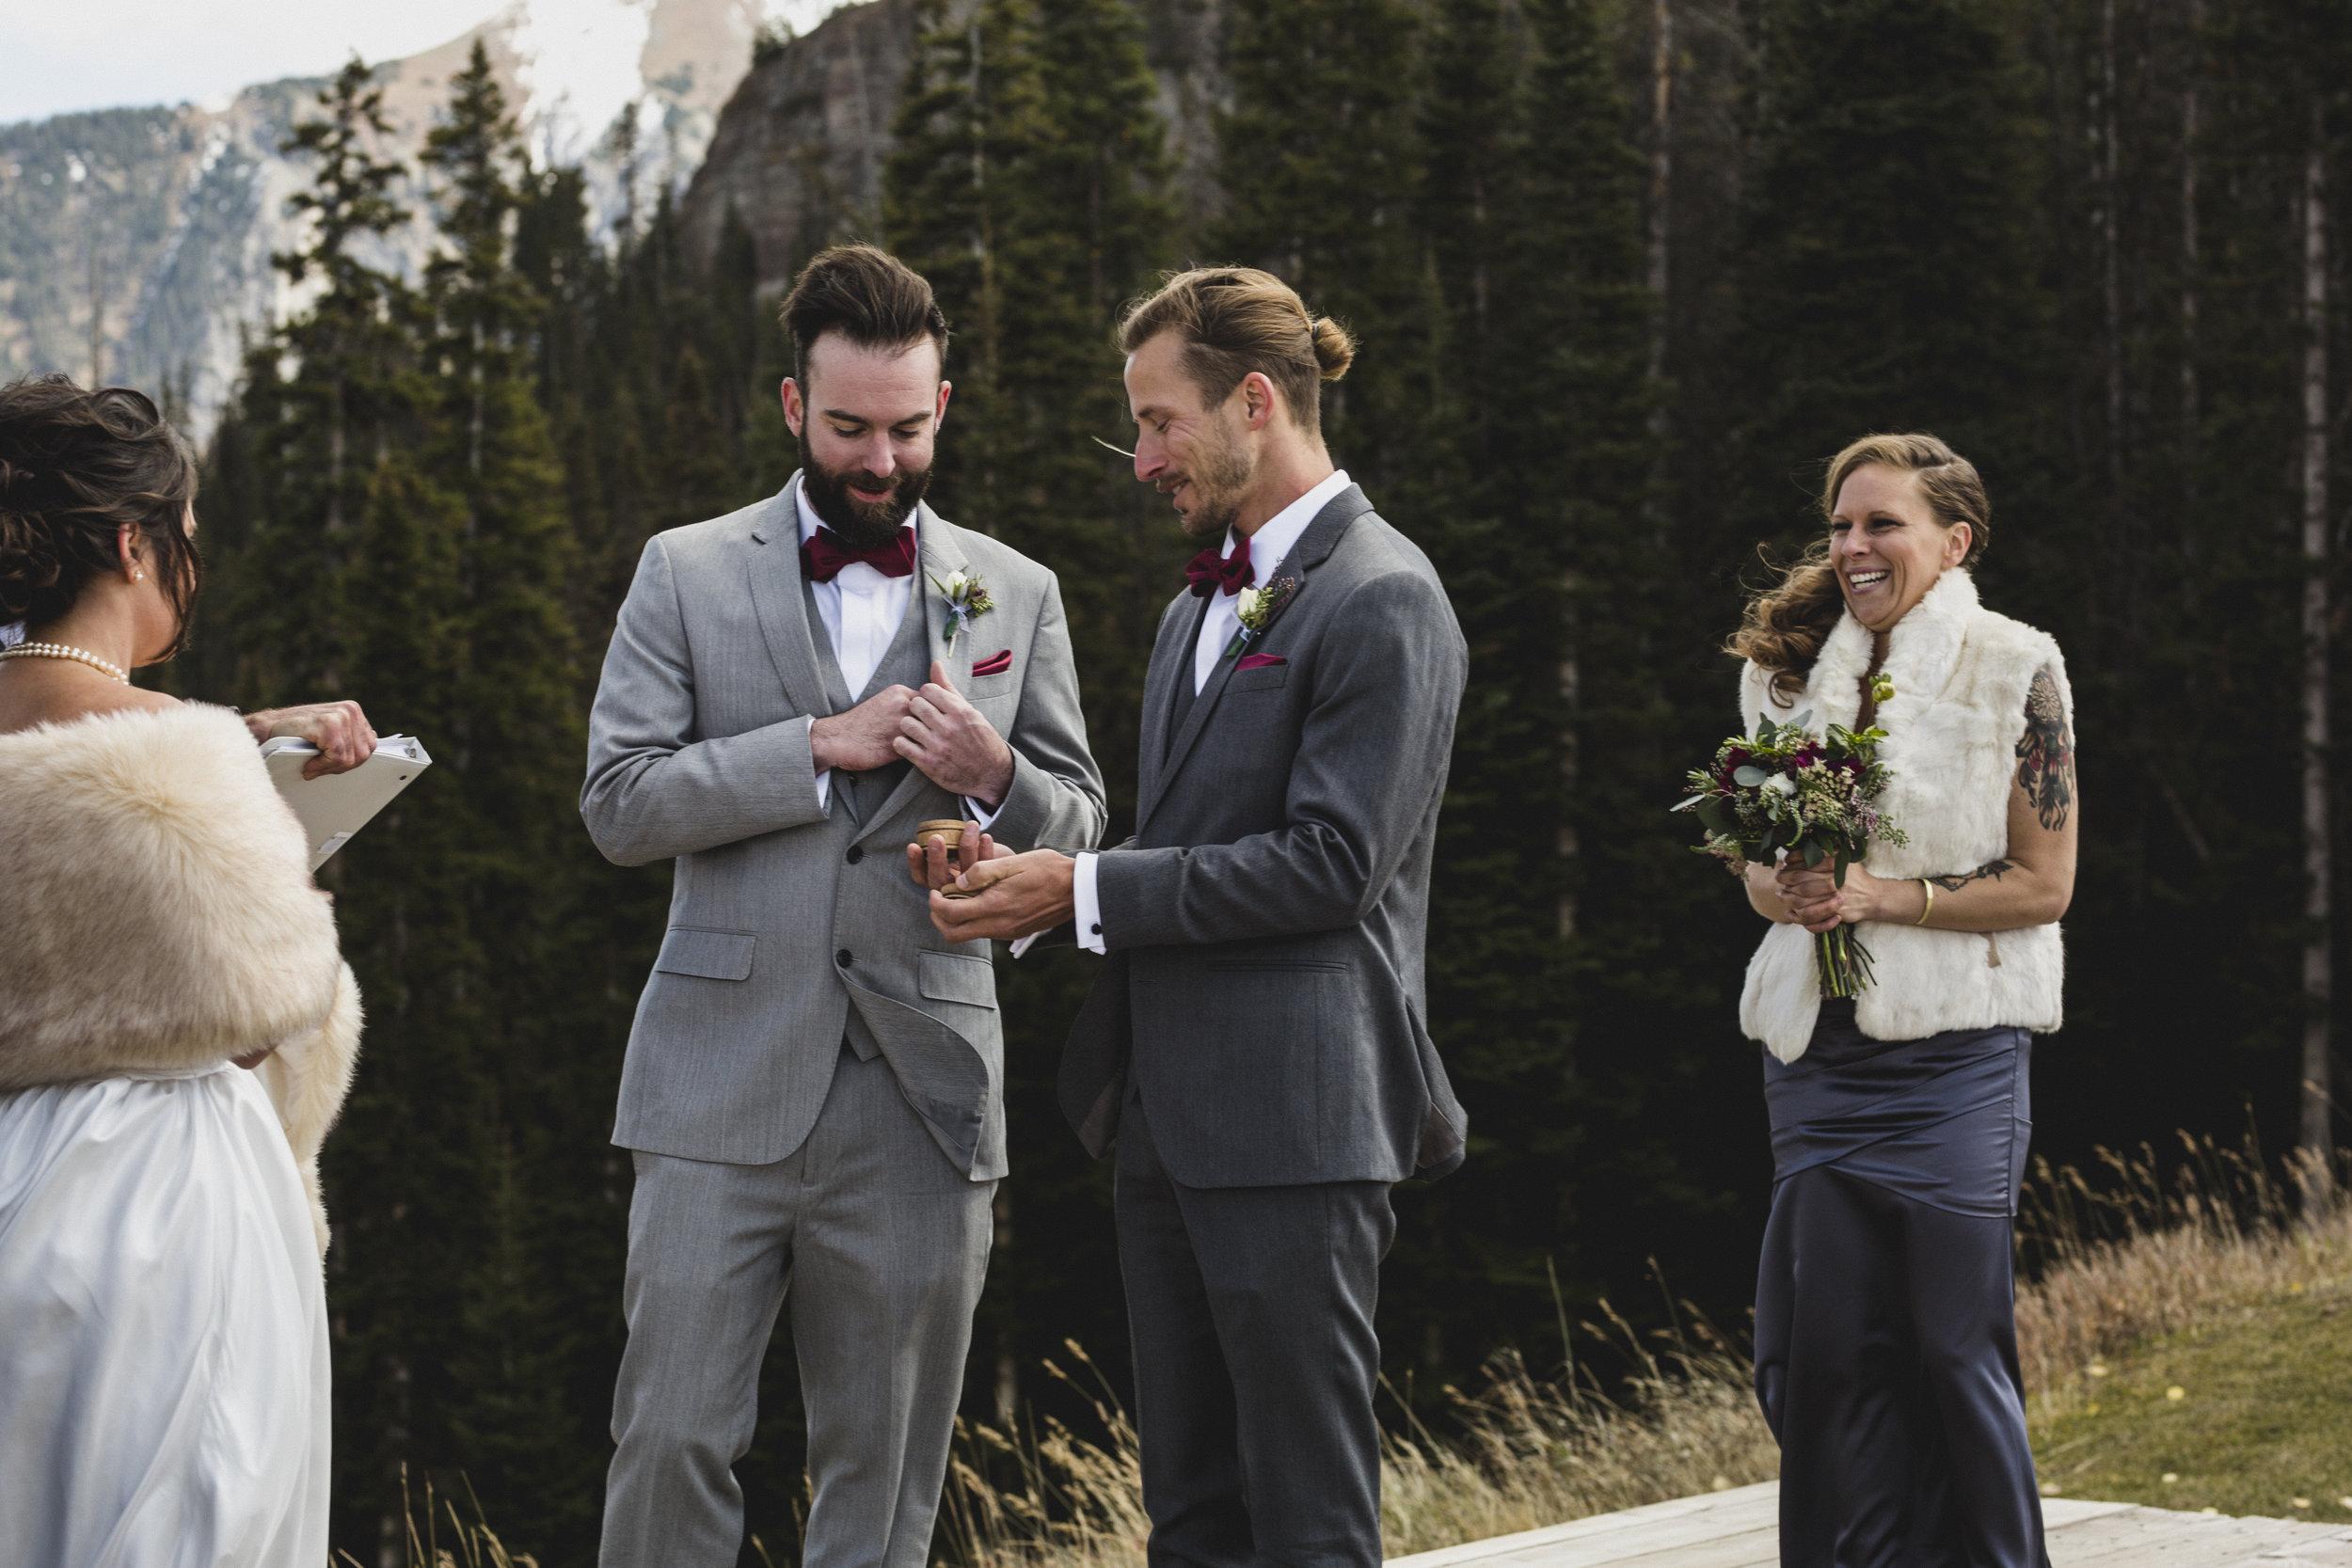 NE-LeahandAshtonphotography-Telluride-Wedding-Photography-9392.jpg